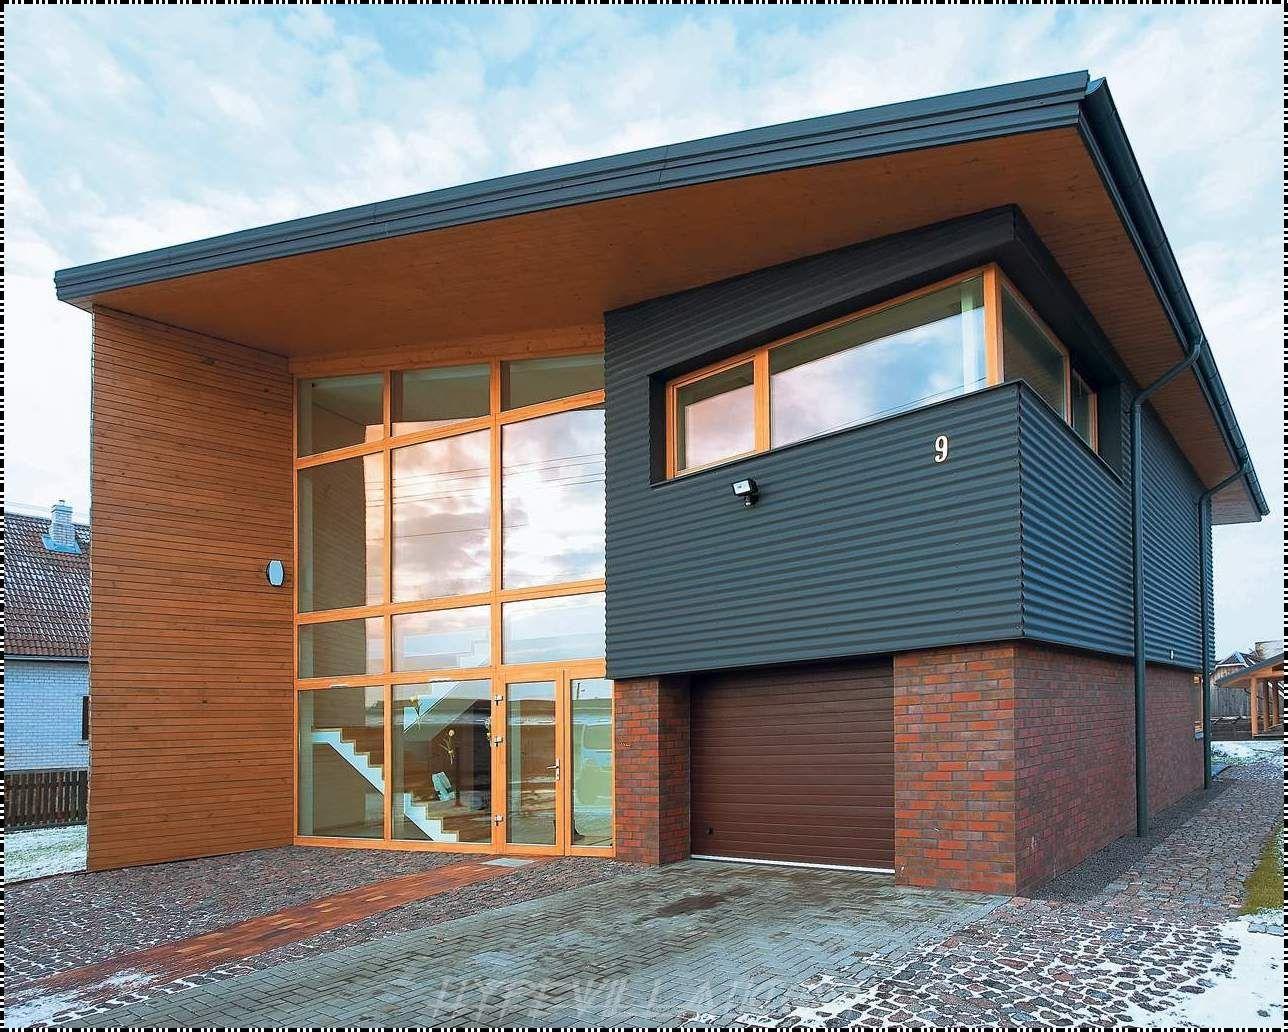 Tiny houses Brick House Modern Brick And Wooden House Fresh